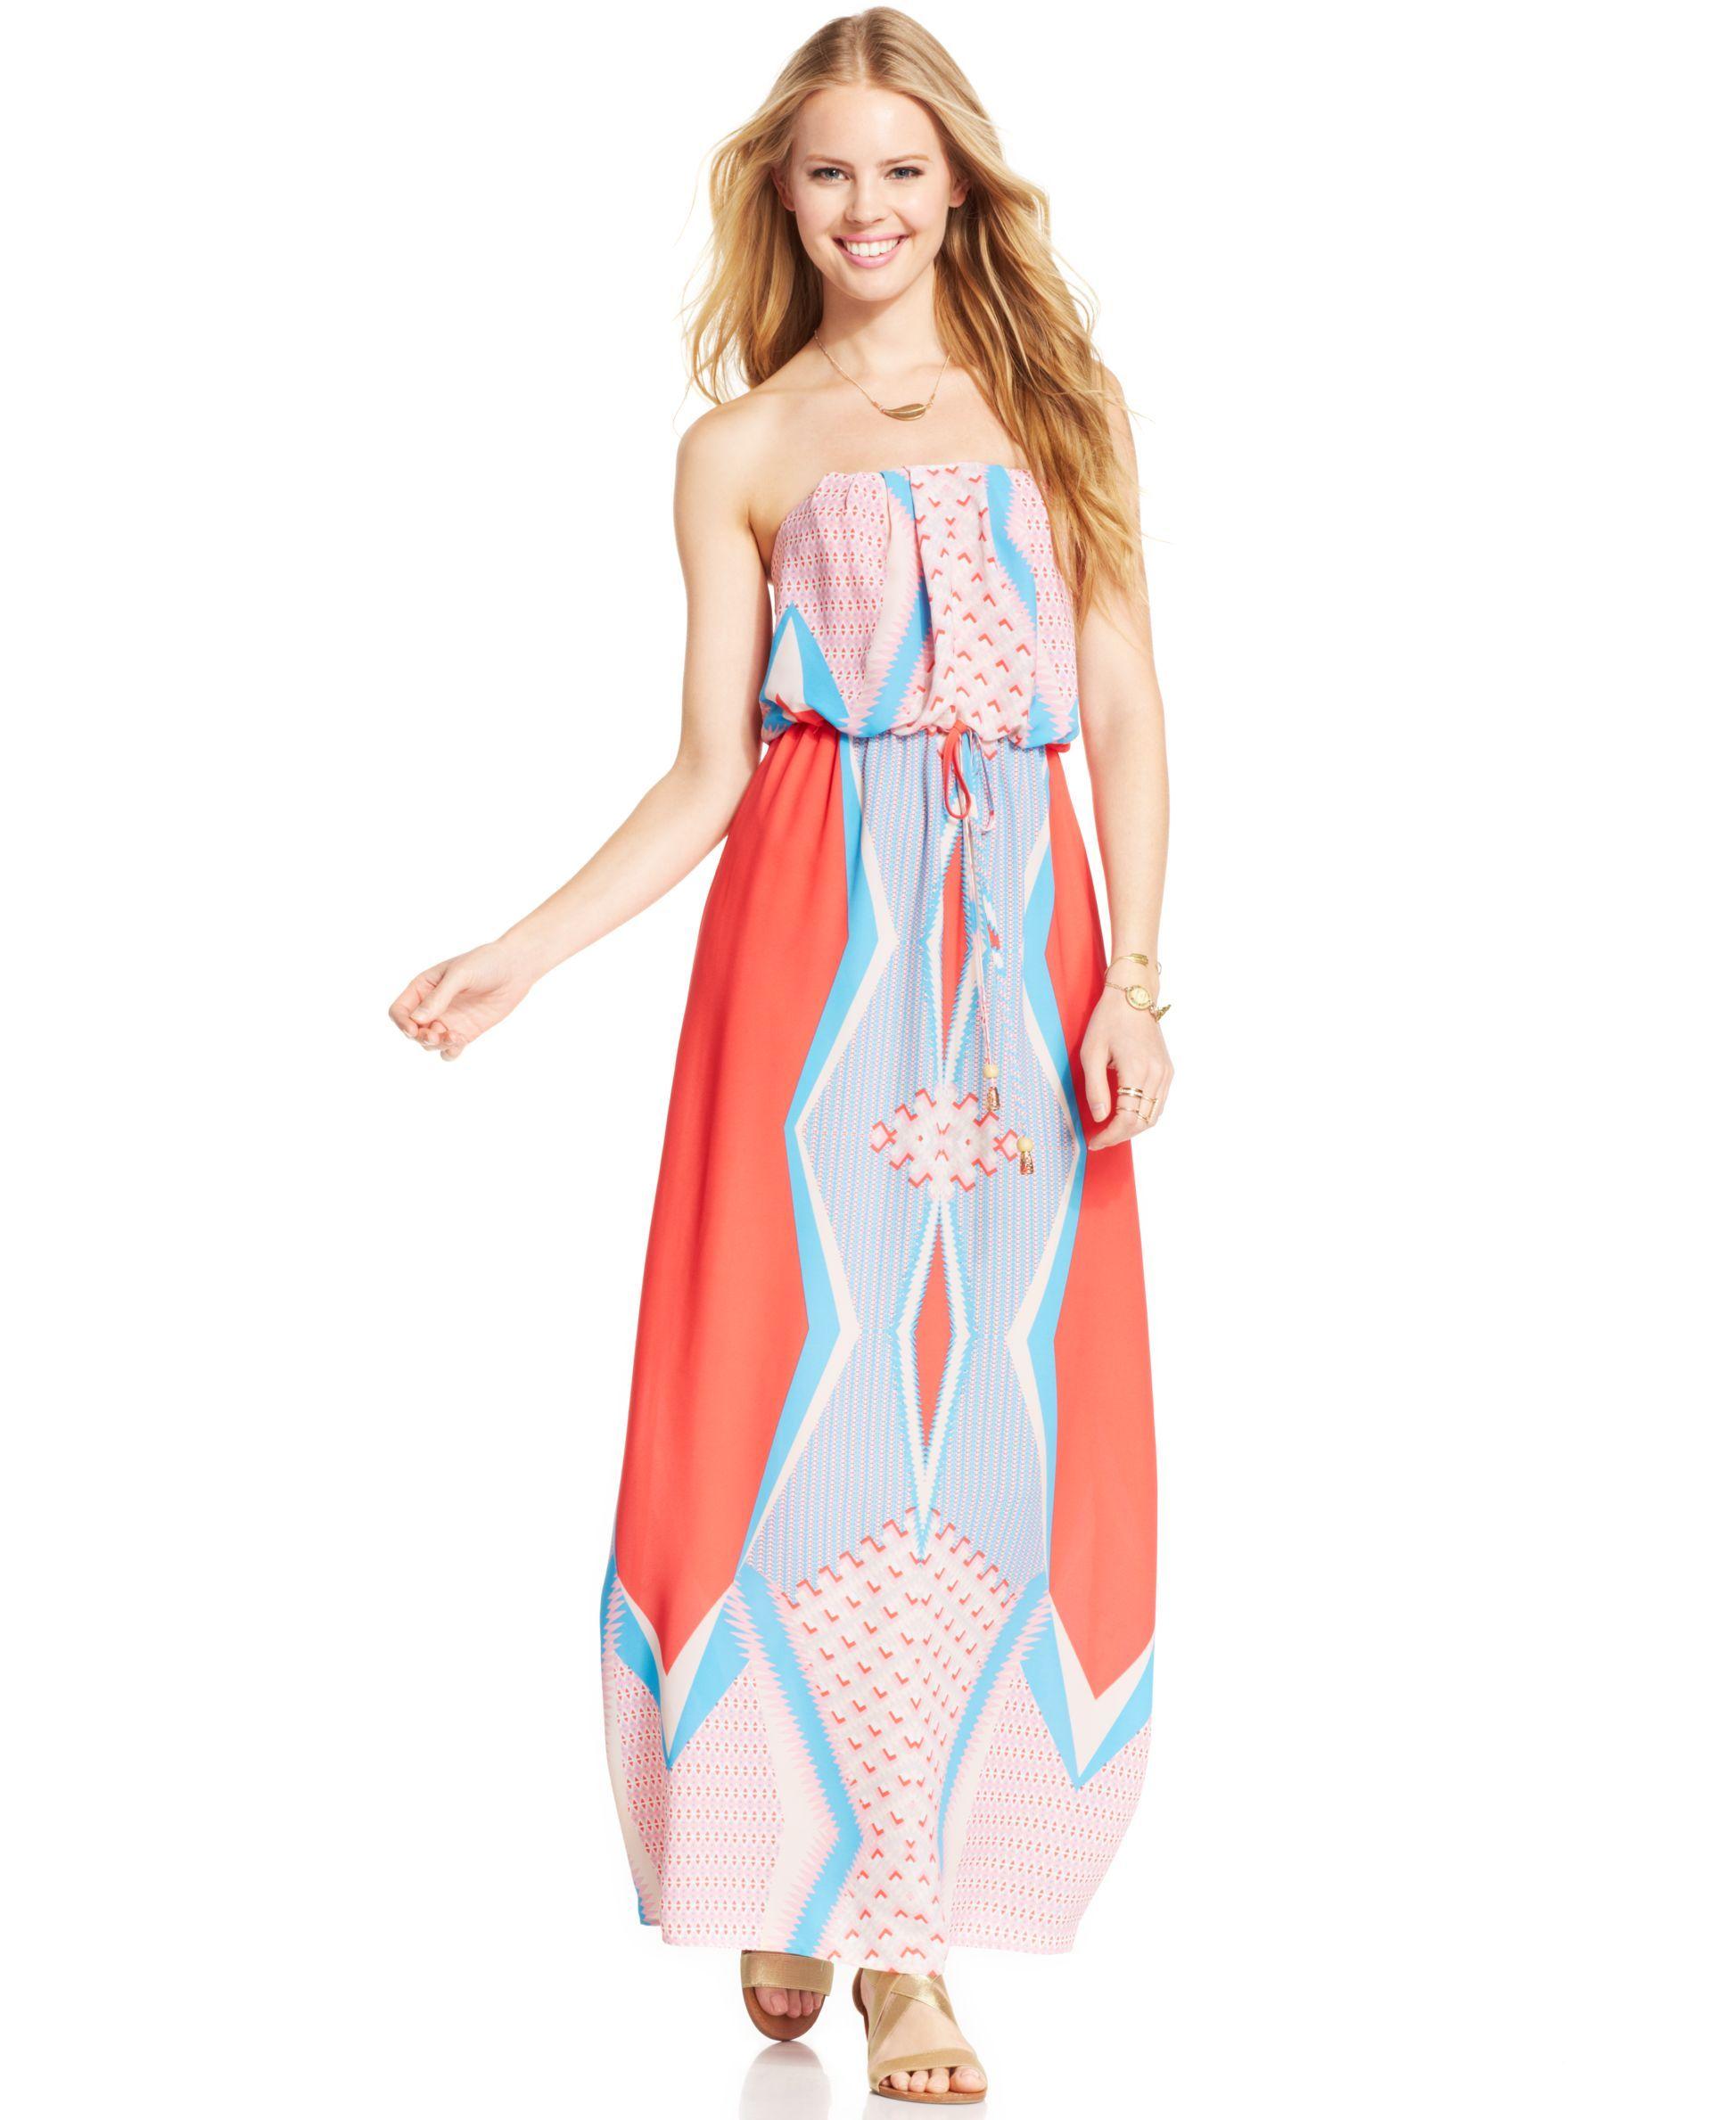 City studios juniorsu printed drawstring maxi dress products